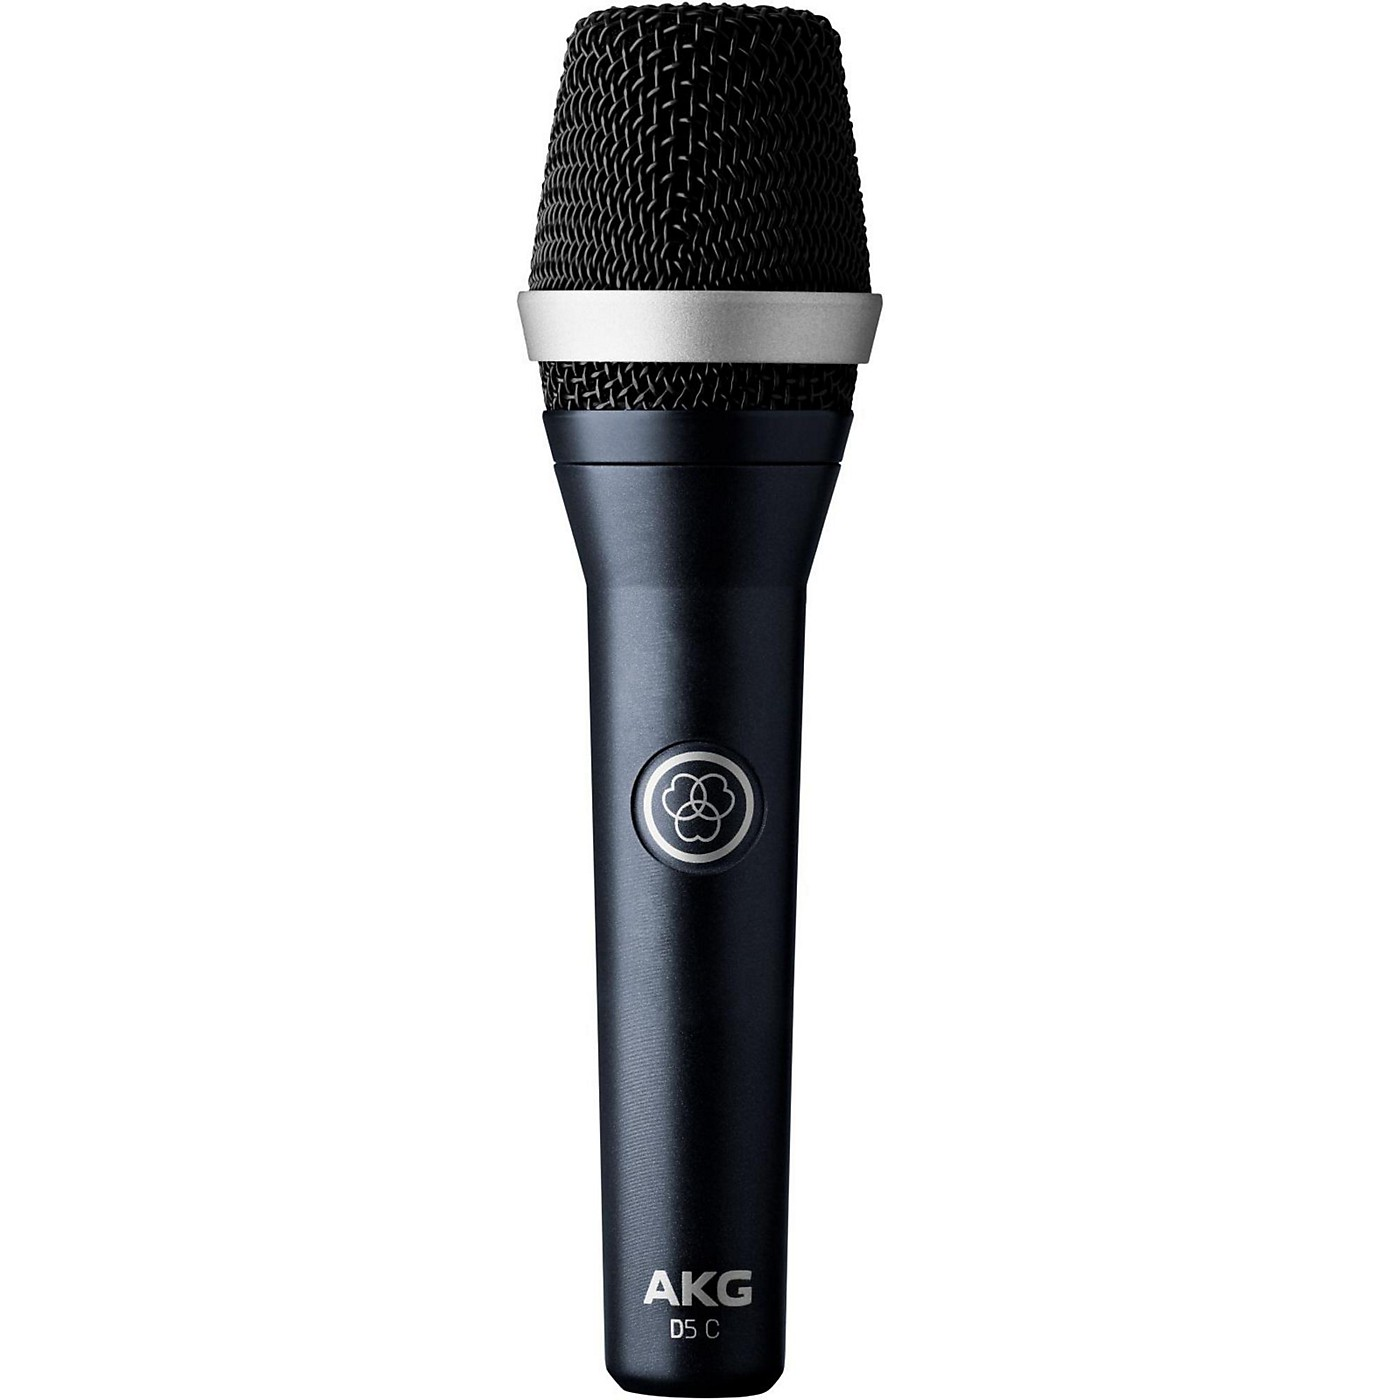 AKG D5 C Cardioid Handheld Dynamic Microphone thumbnail